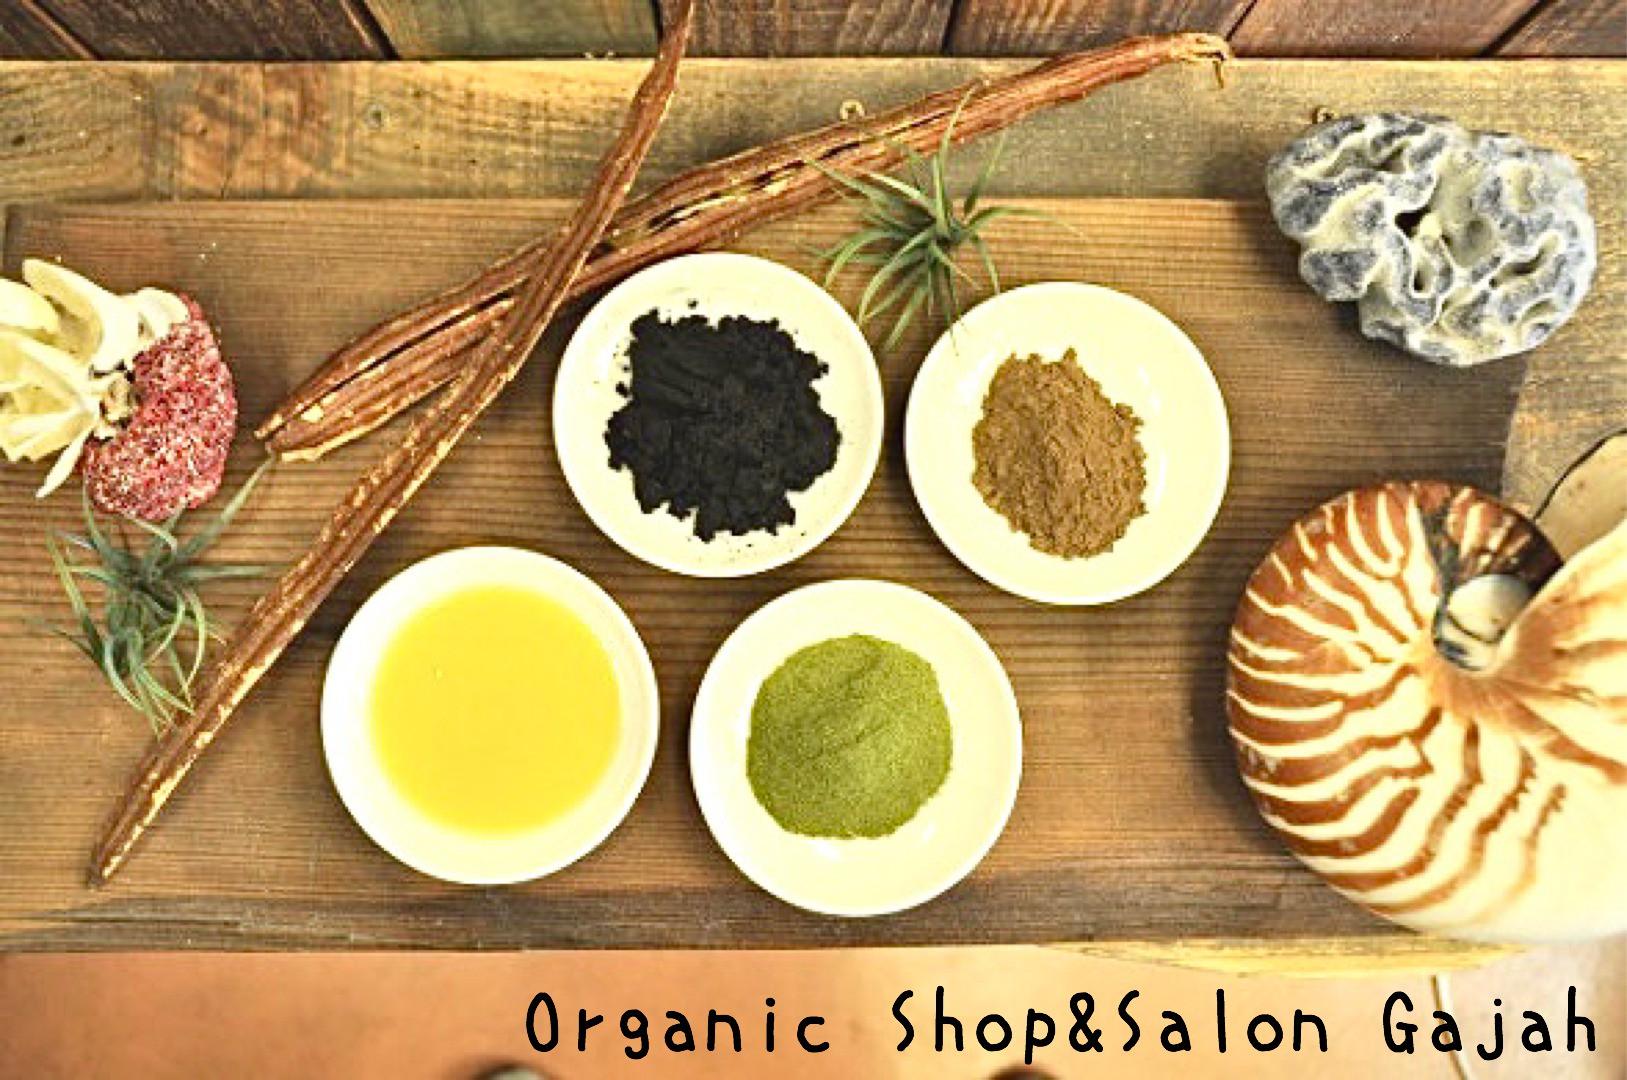 Organic Shop Gajah